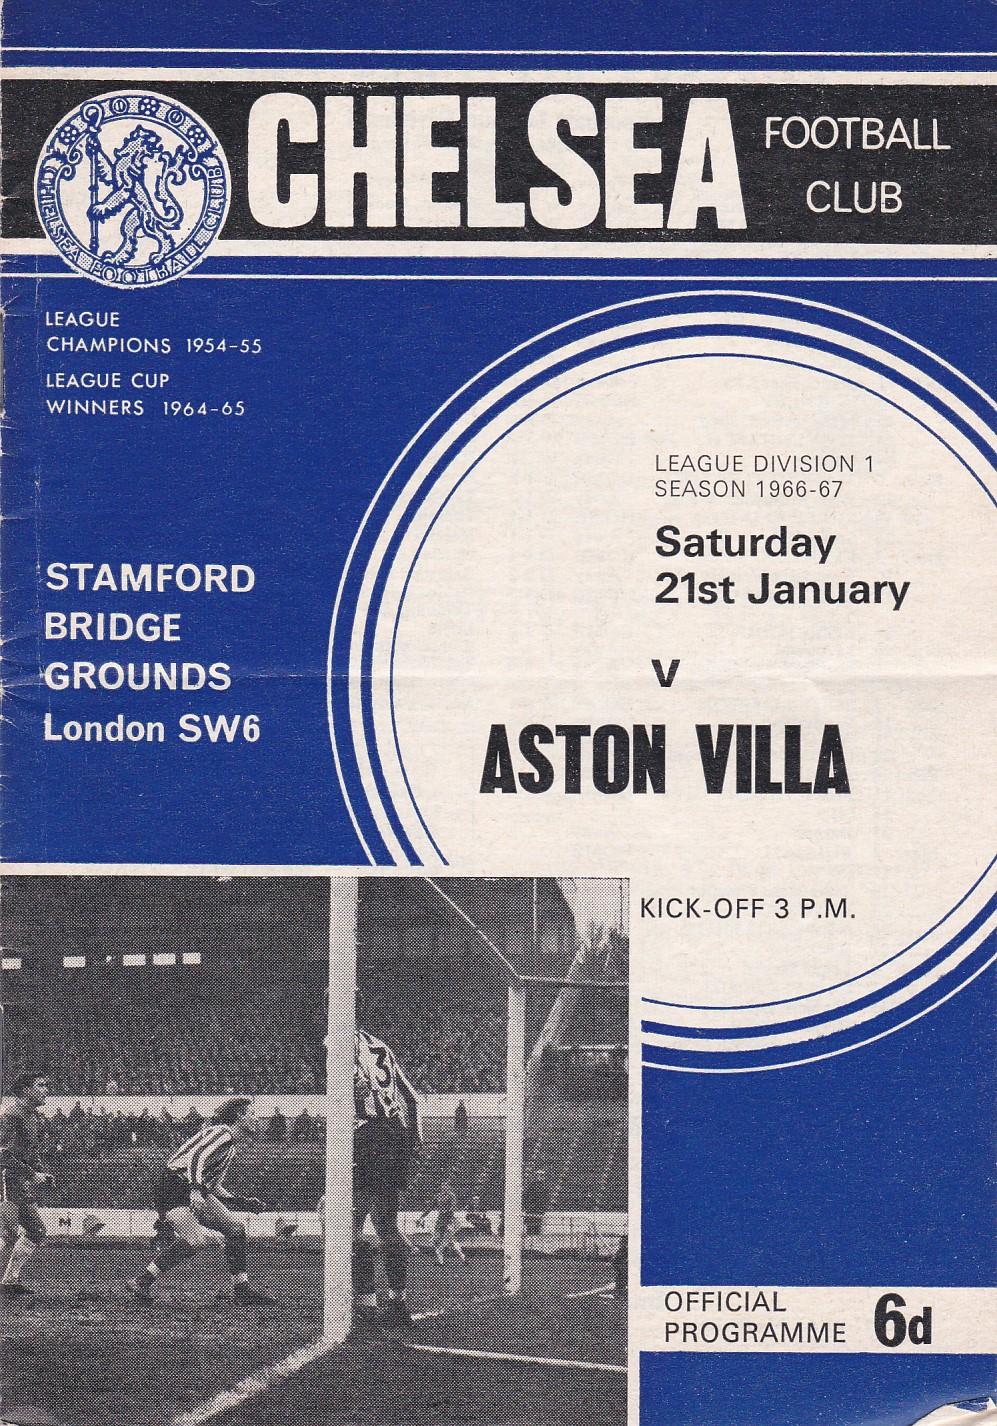 Chelsea v Aston Villa 1967 January 21st League horizontal crease coupon removed back